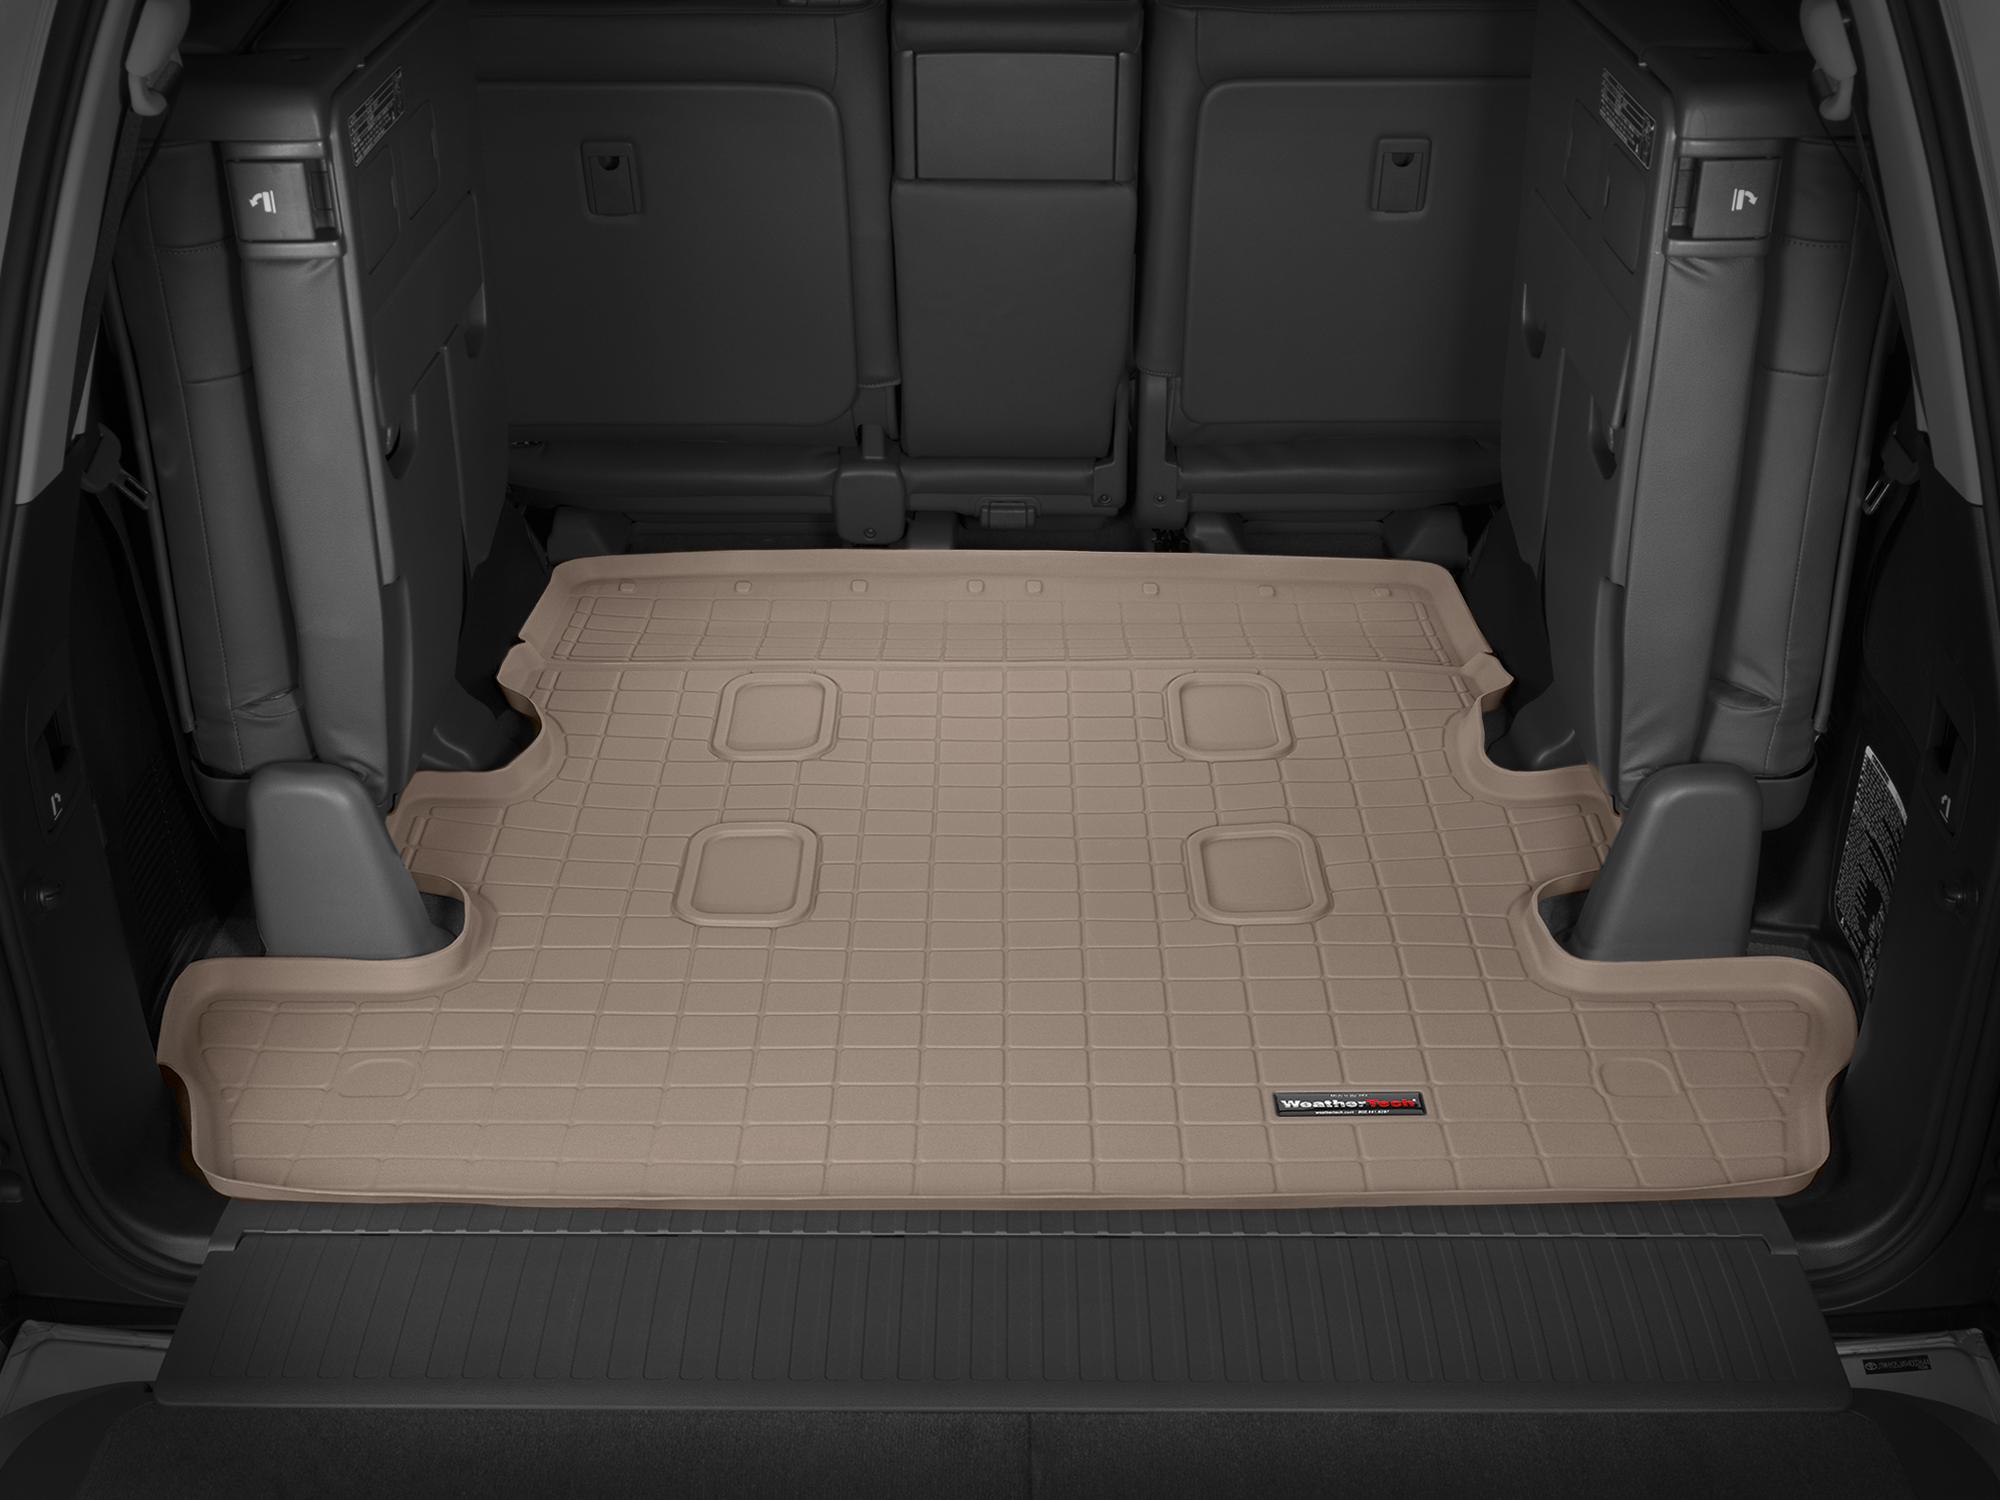 Toyota Land Cruiser V8 2008>2017 Vasca baule tappeto bagagliaio marrone *1249